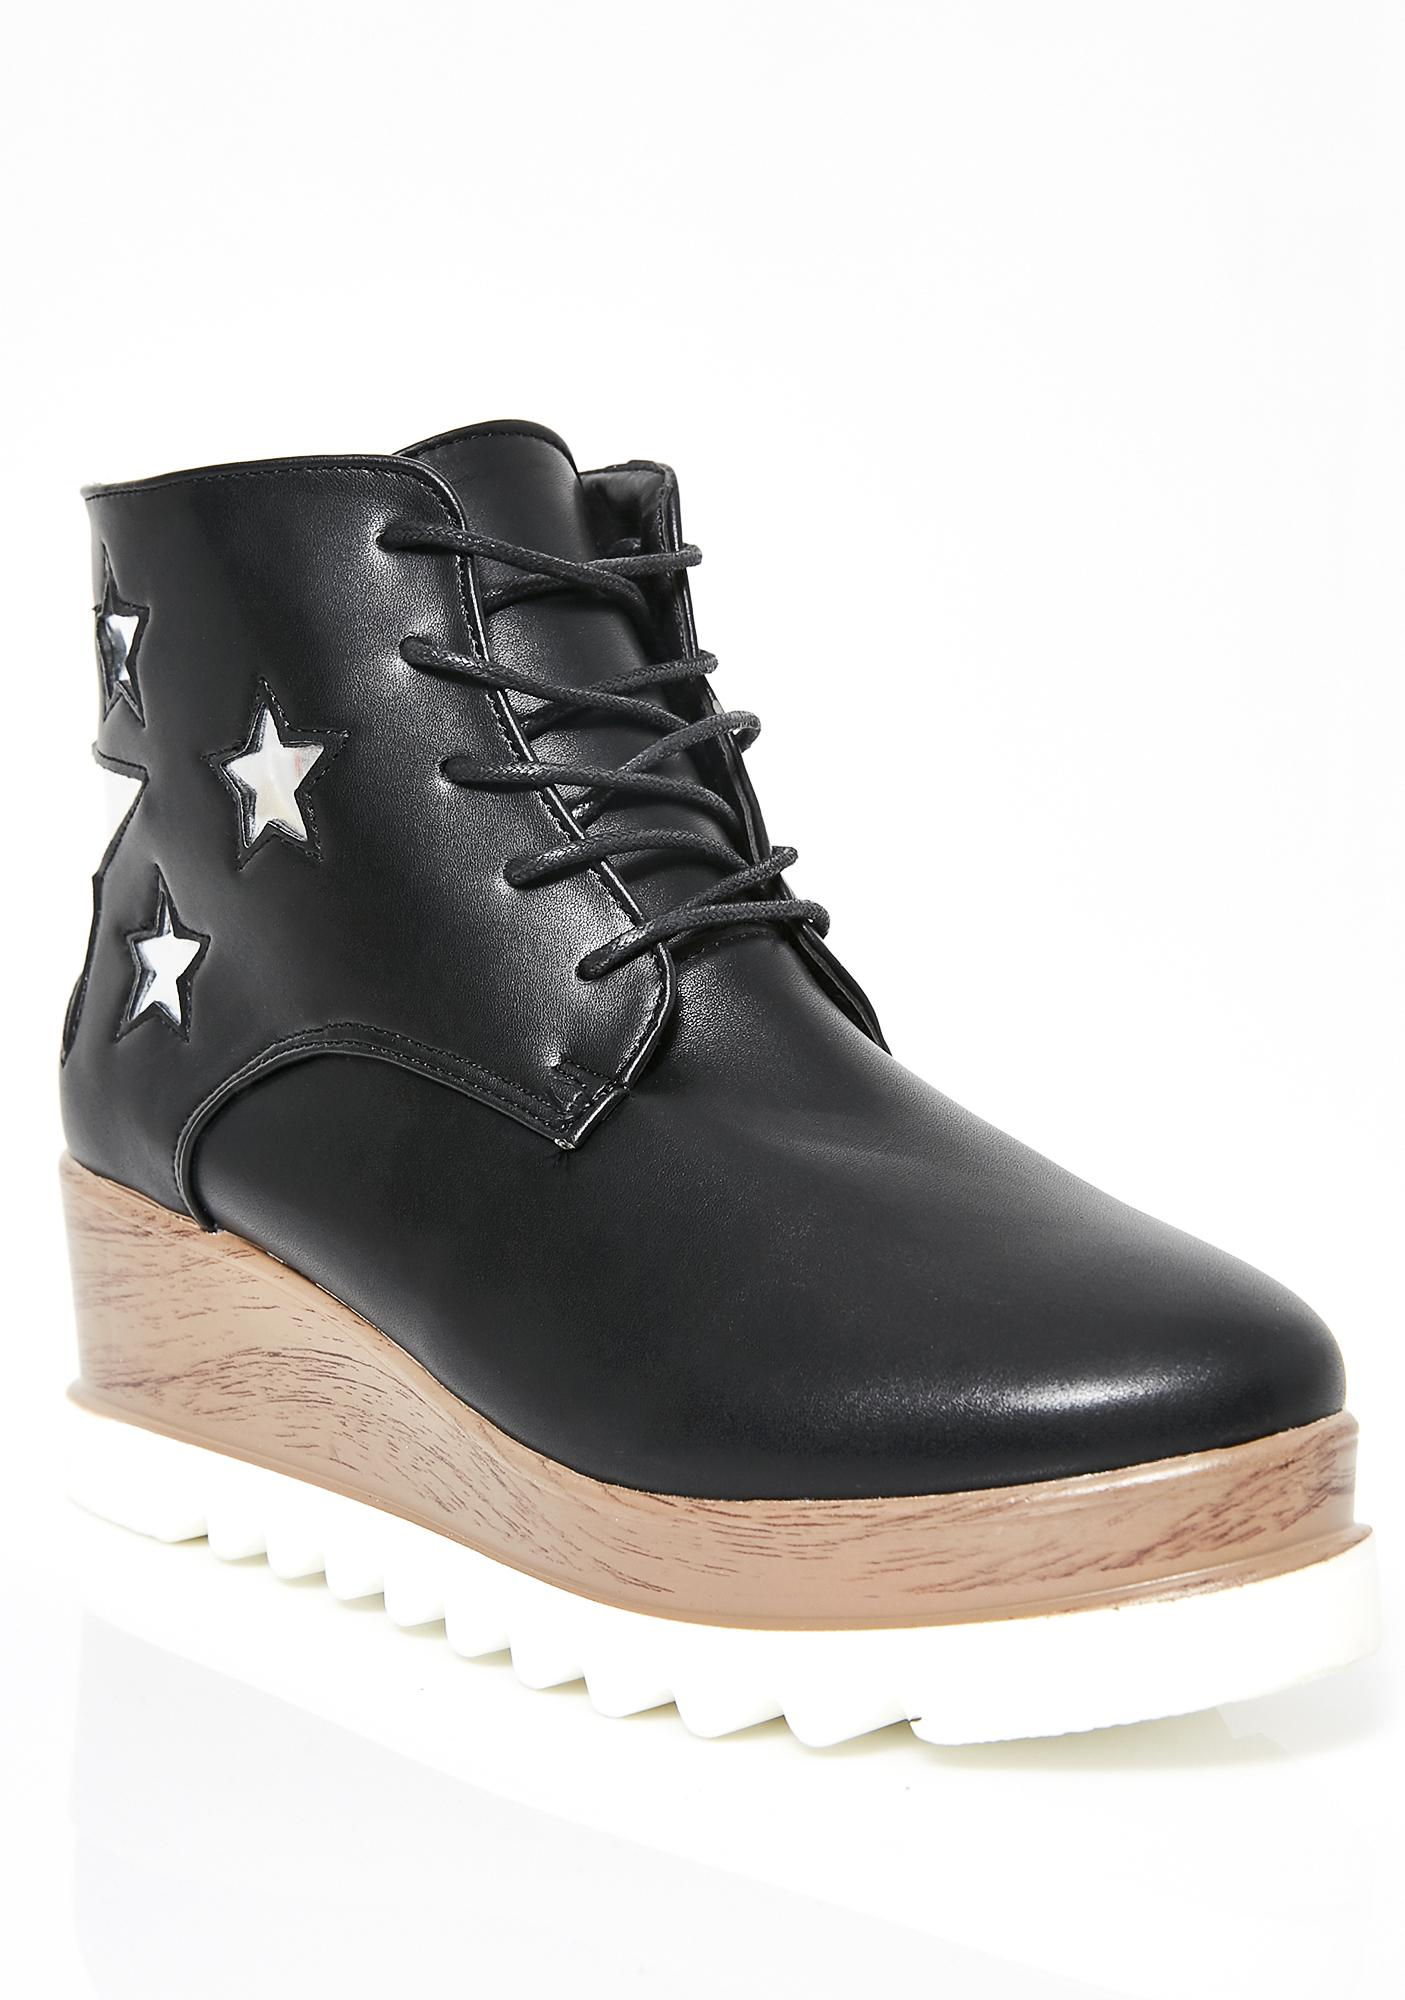 Extra Terrestrial Platform Boots